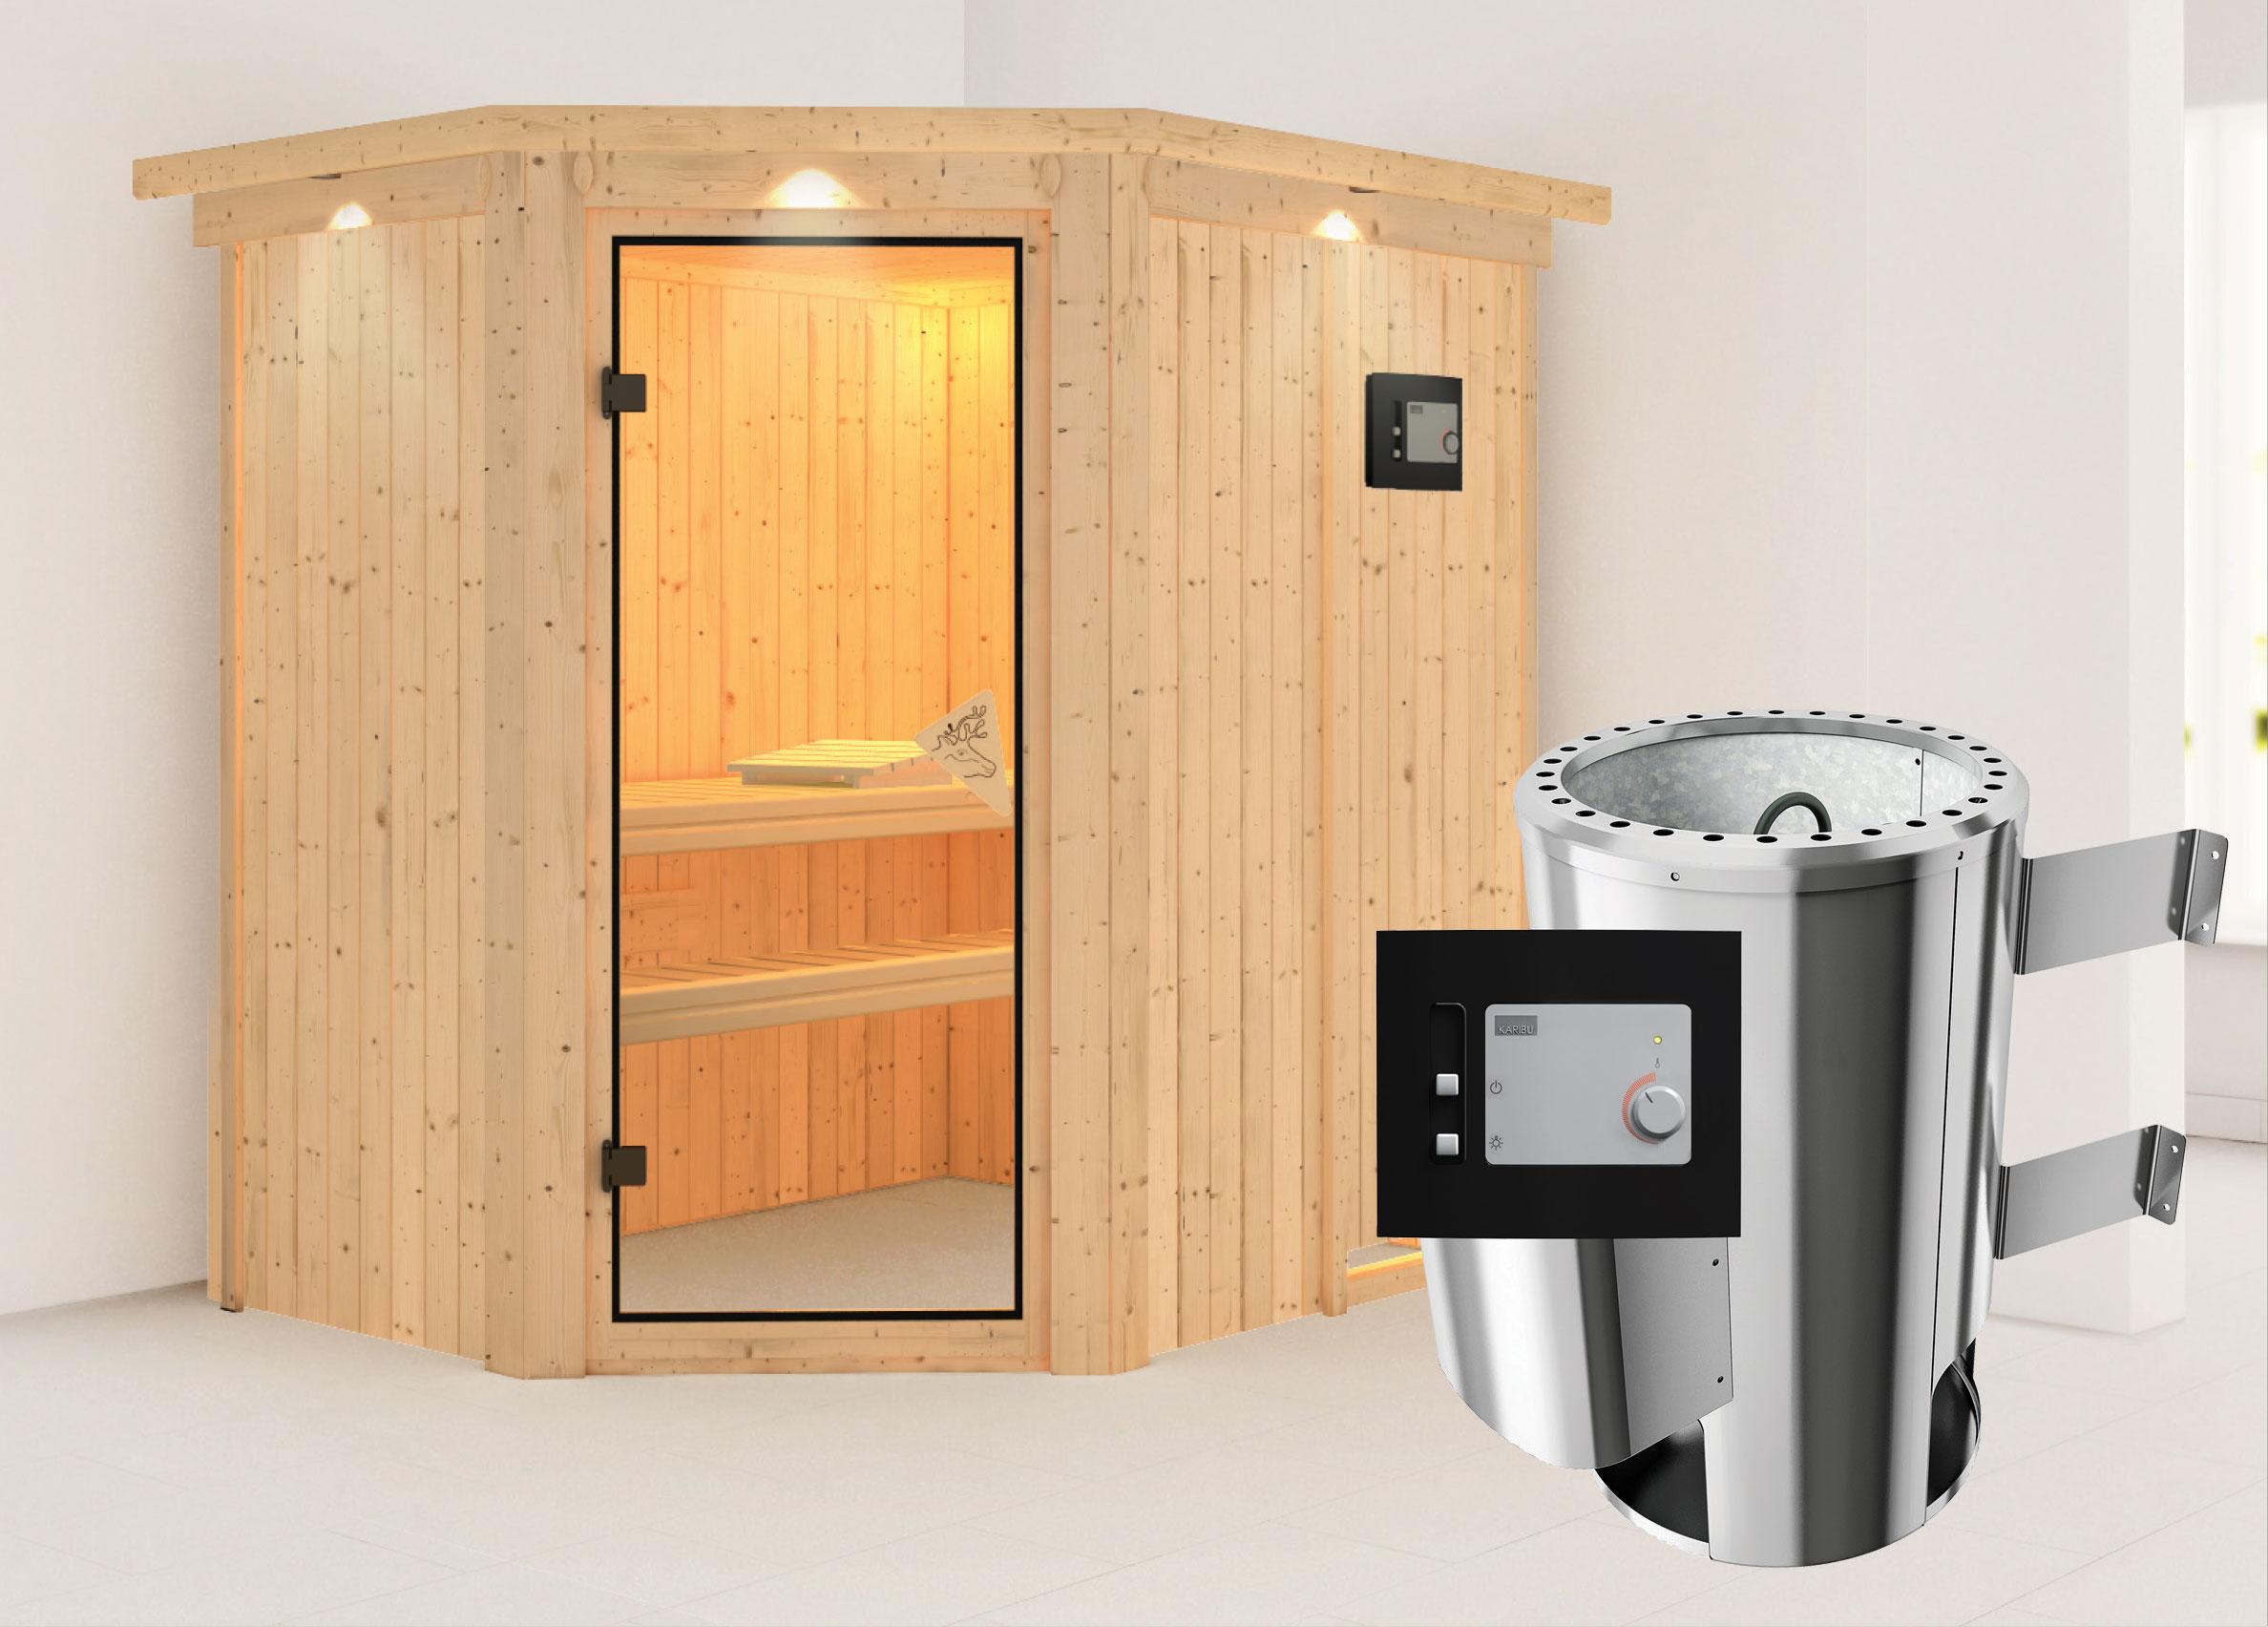 Karibu Sauna Saja 68mm 230V Dachkranz + Ofen 3,6kW extern classic Tür Bild 1